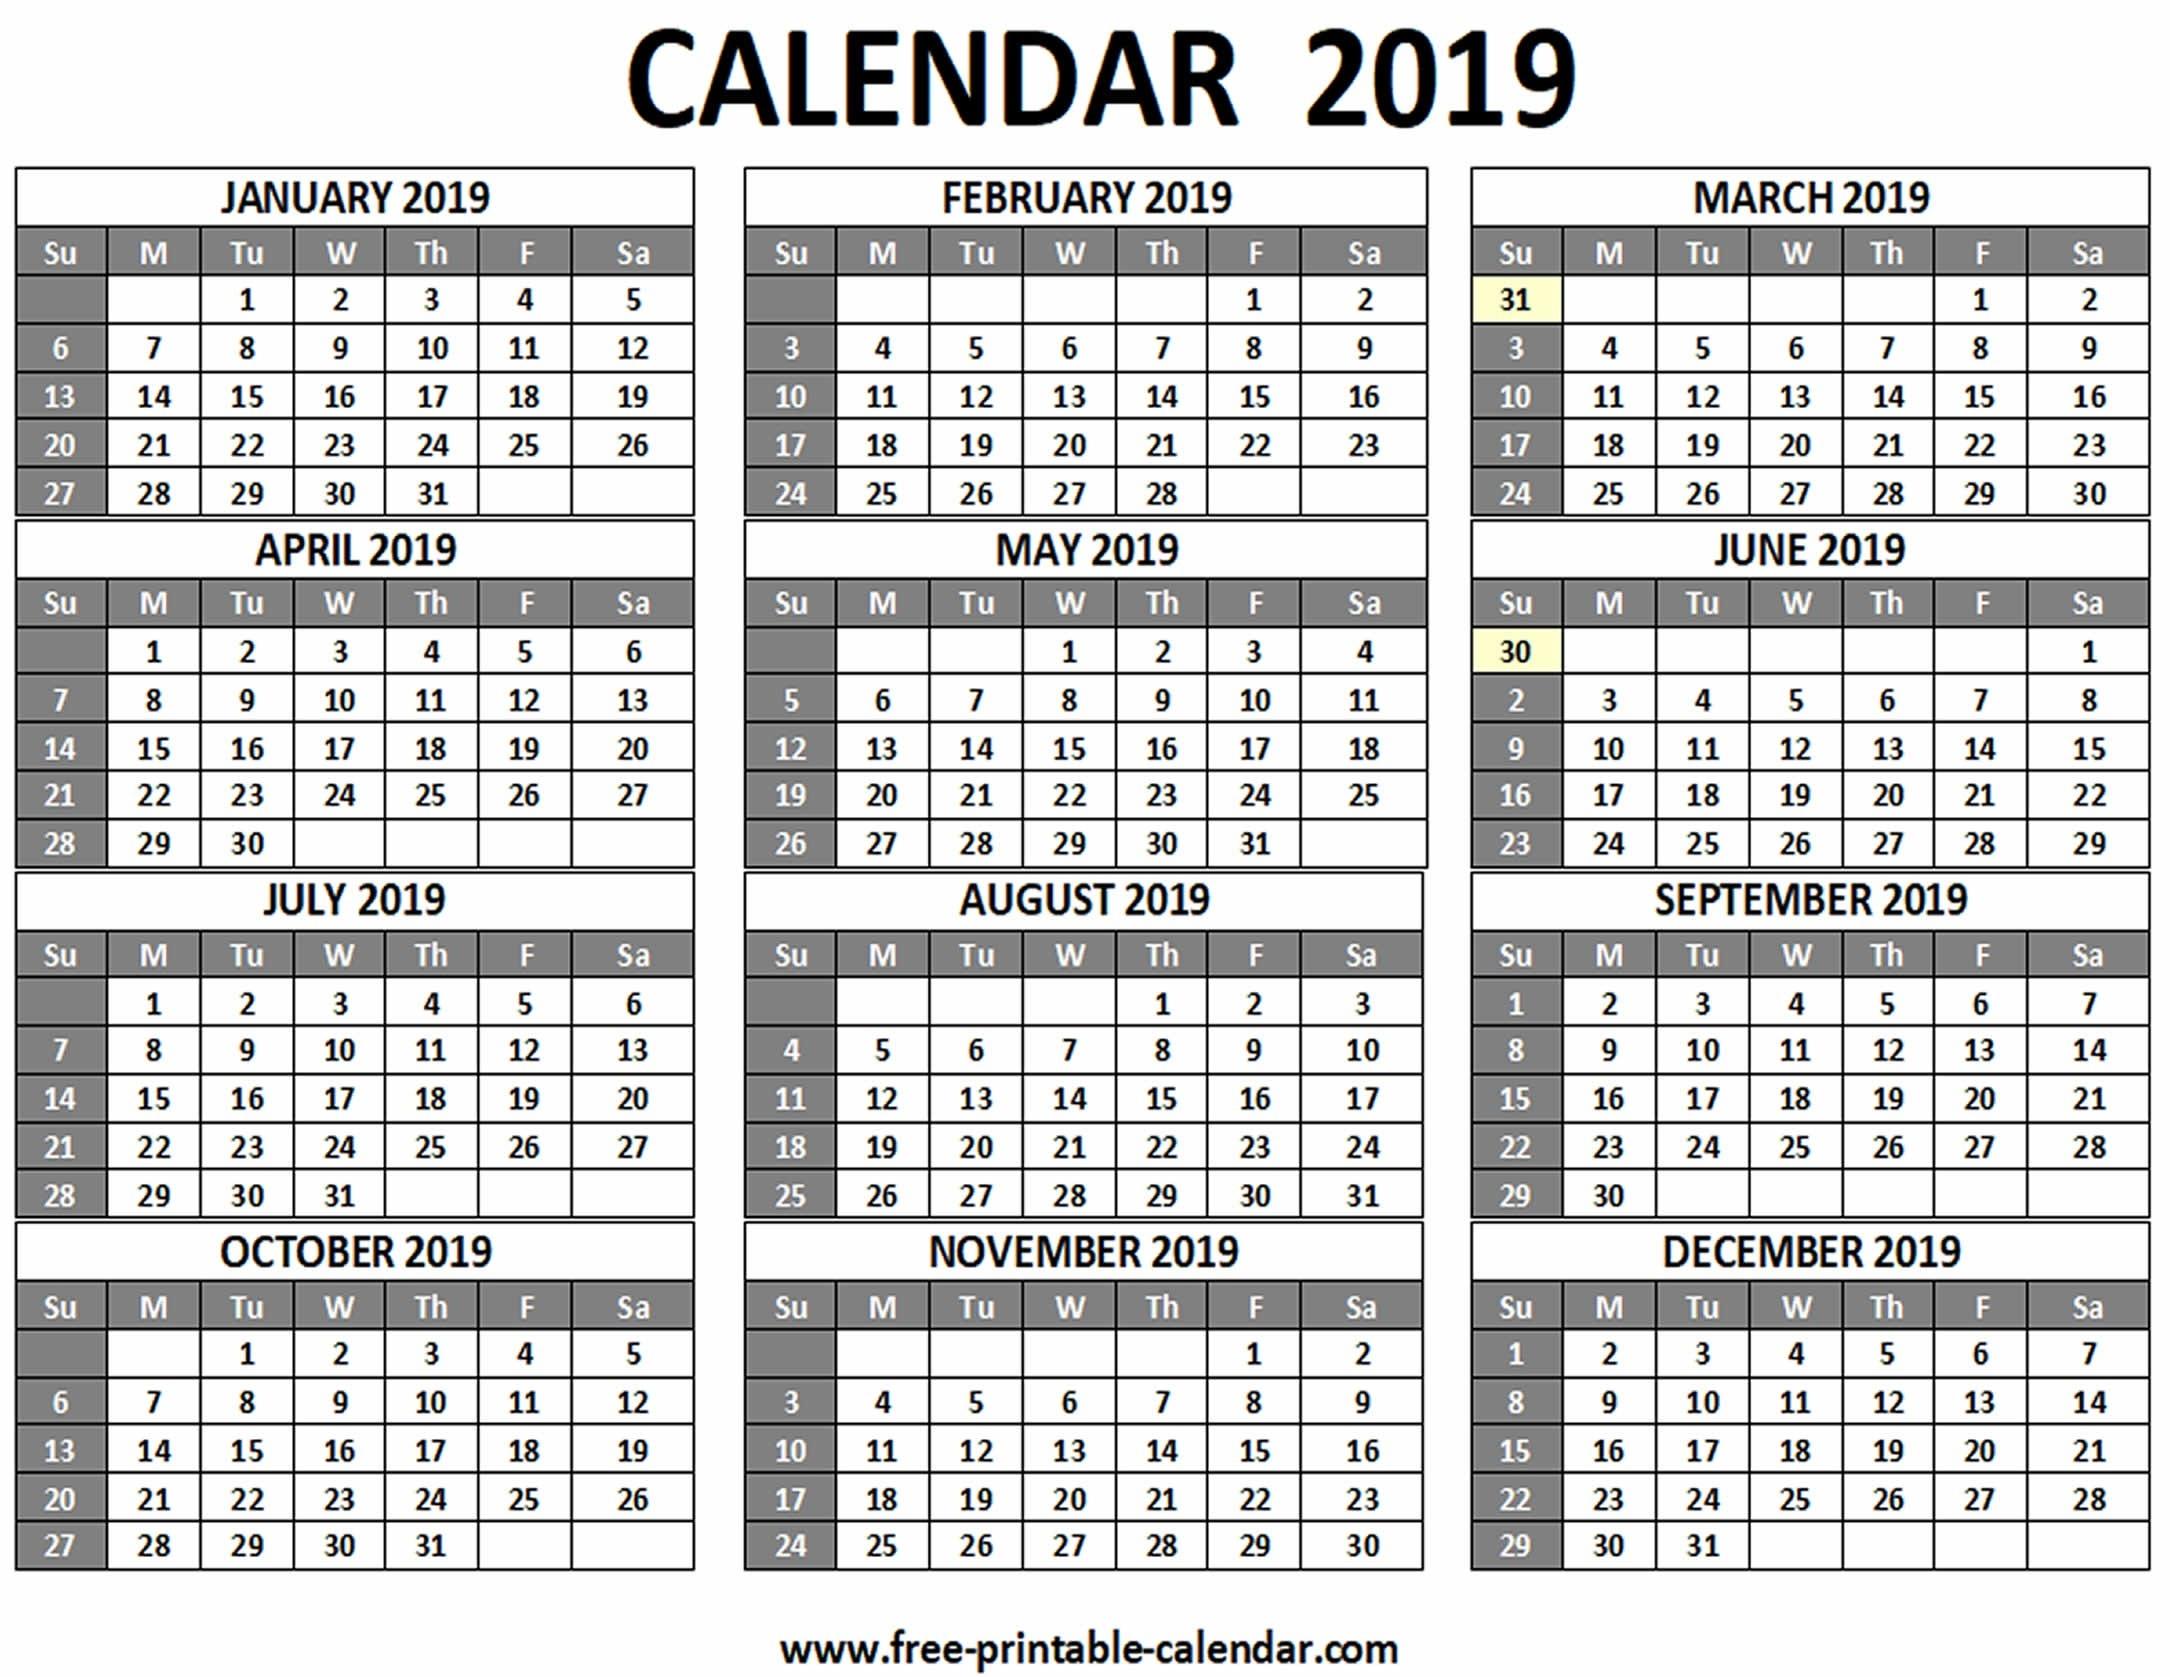 Printable 2019 Calendar - Free-Printable-Calendar  12 Month Calendar Free Printable